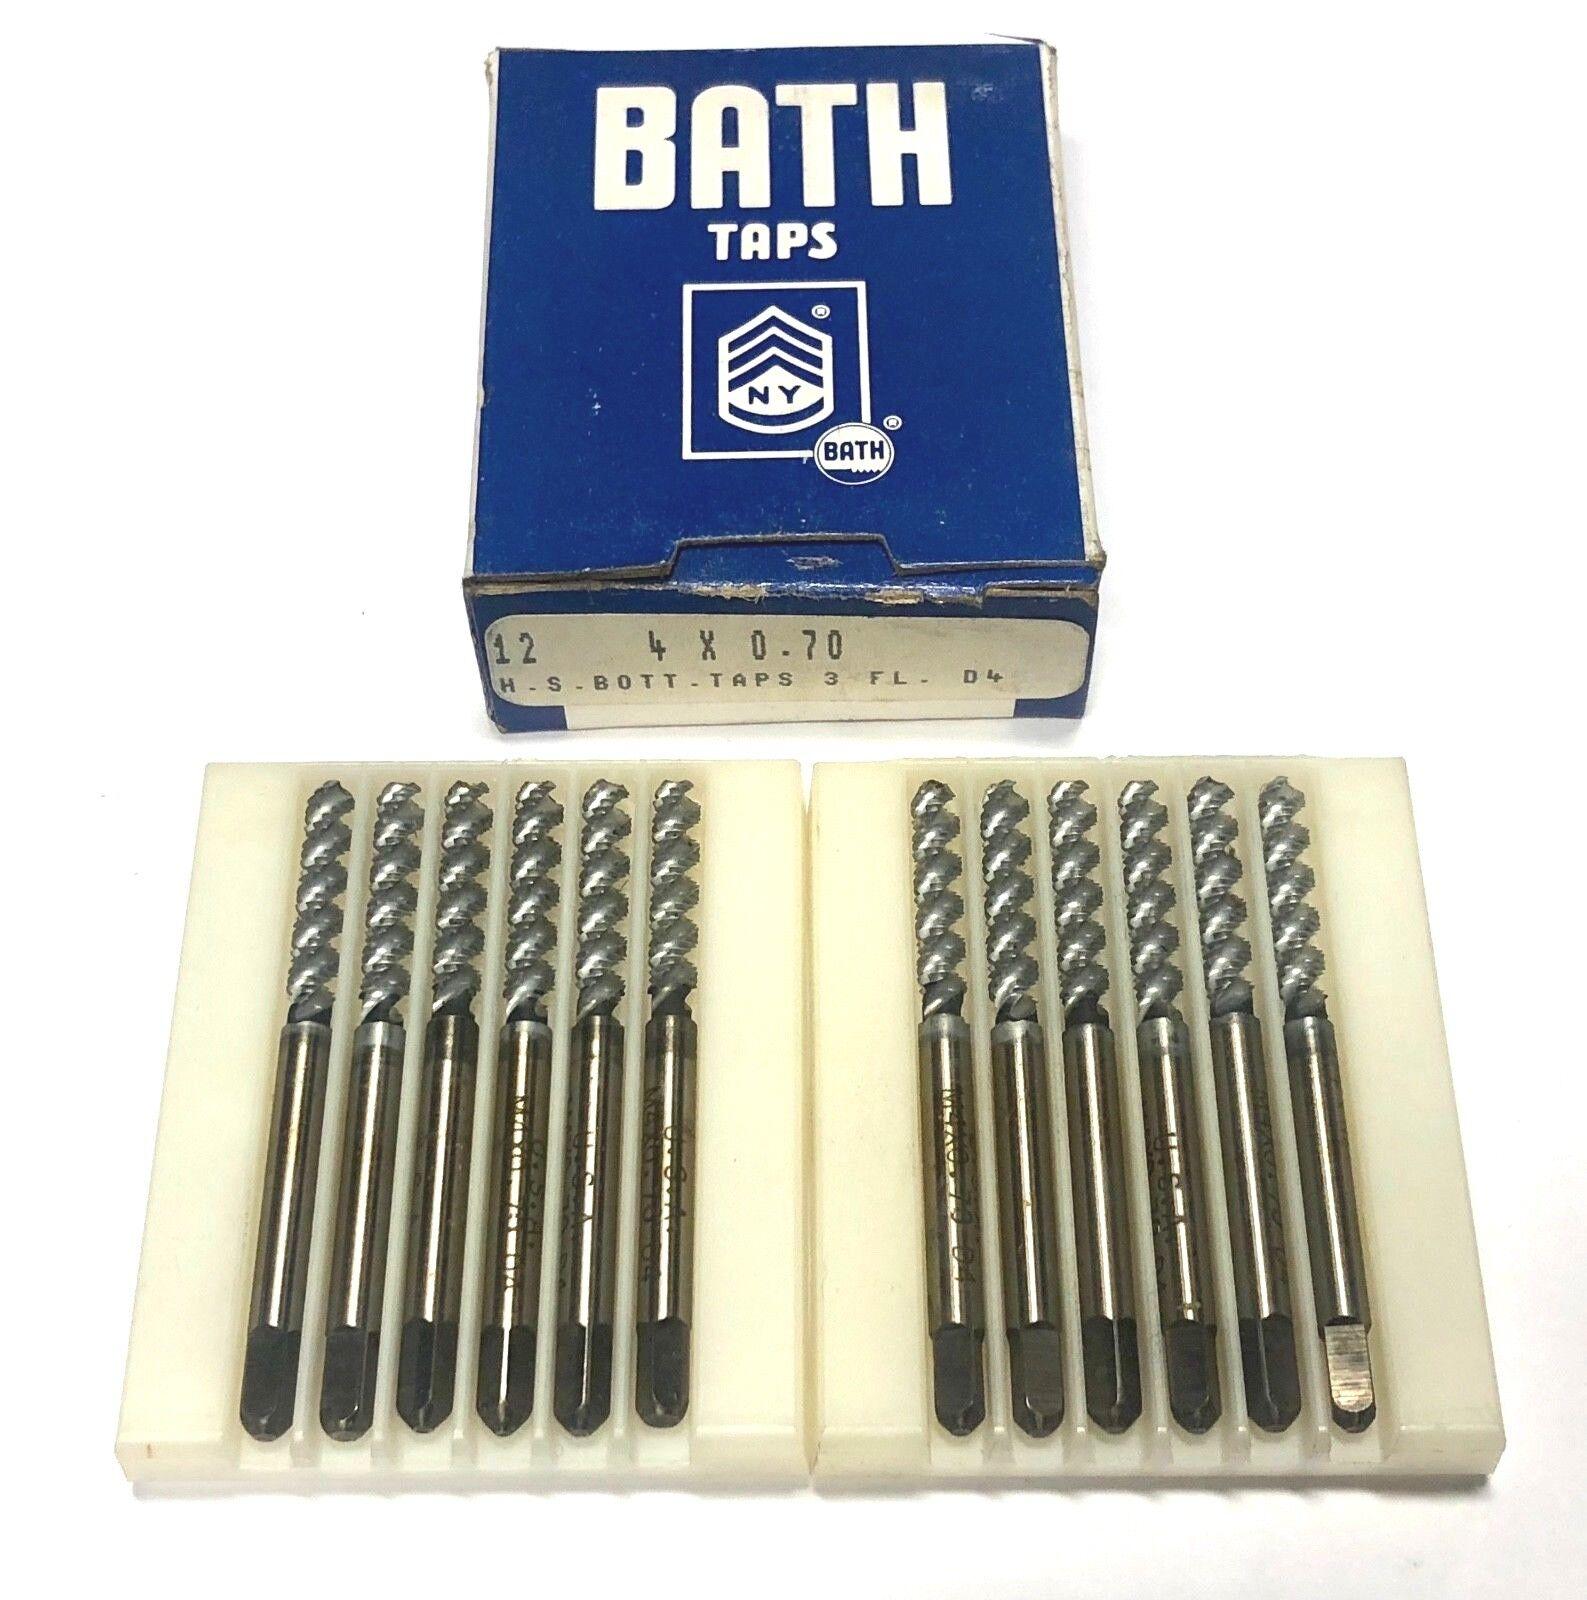 Bath Taps M4 x .70 Hand Tap Spiral Flute Bottoming Taps D4 3FL 12 Pack USA Made